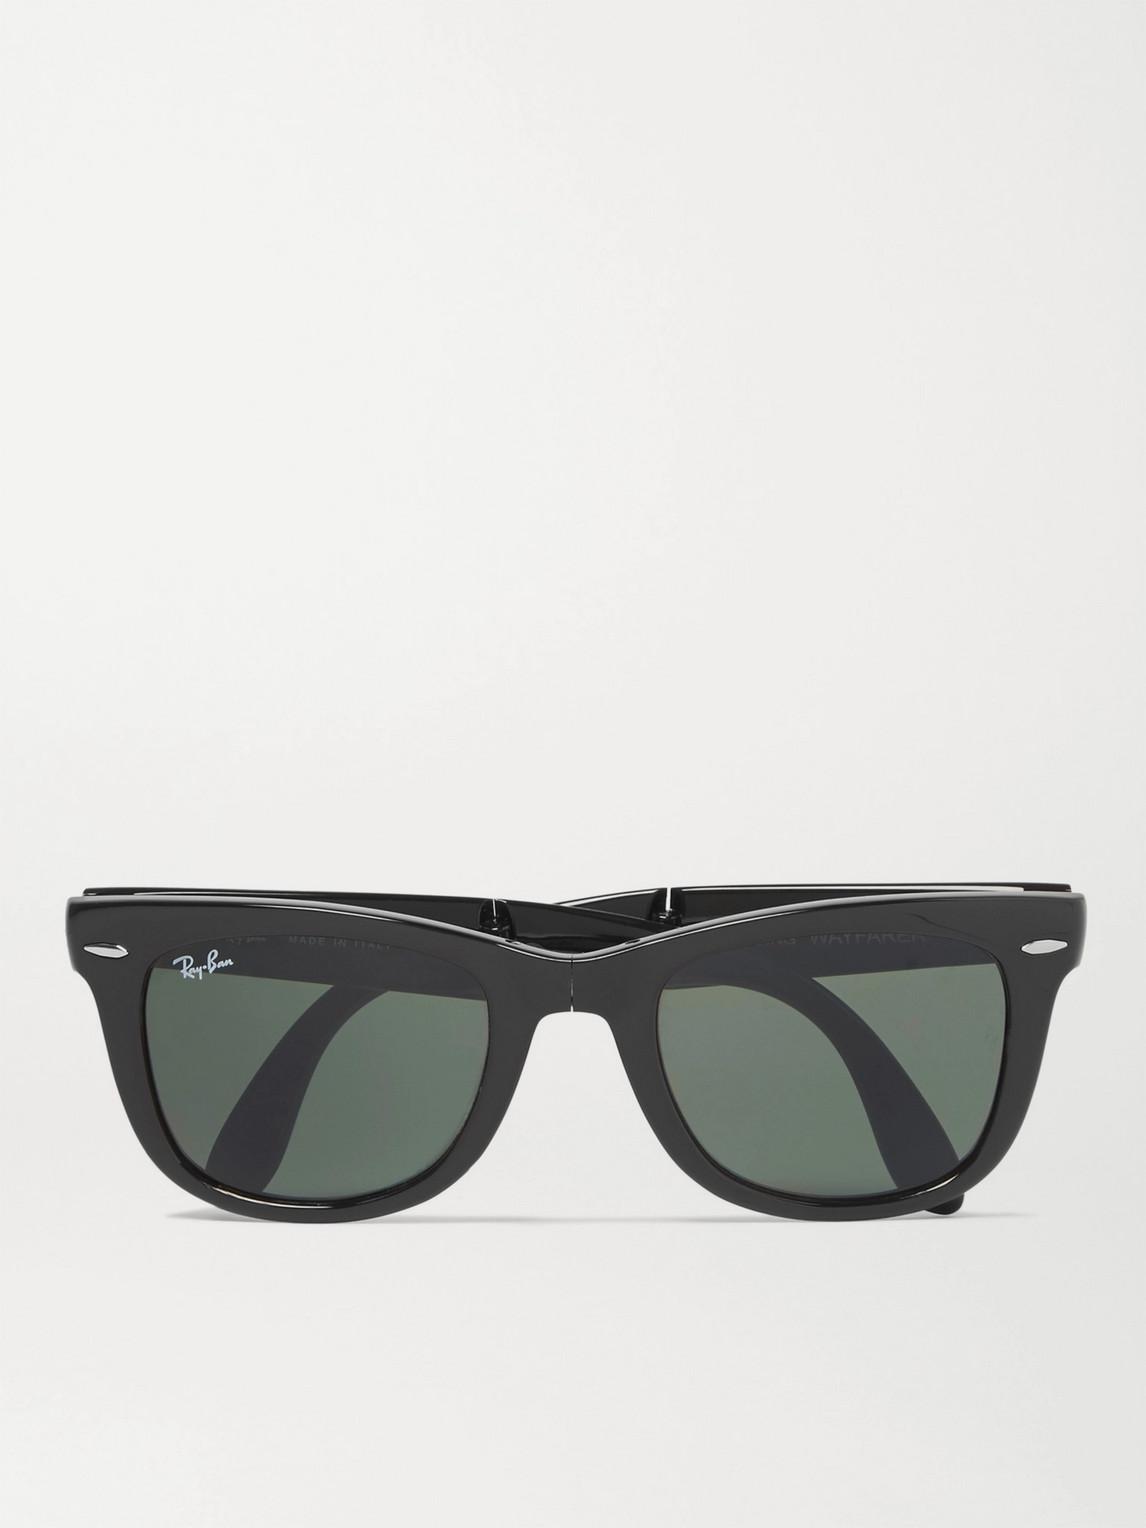 Ray Ban Sunglasses WAYFARER FOLDING ACETATE SUNGLASSES